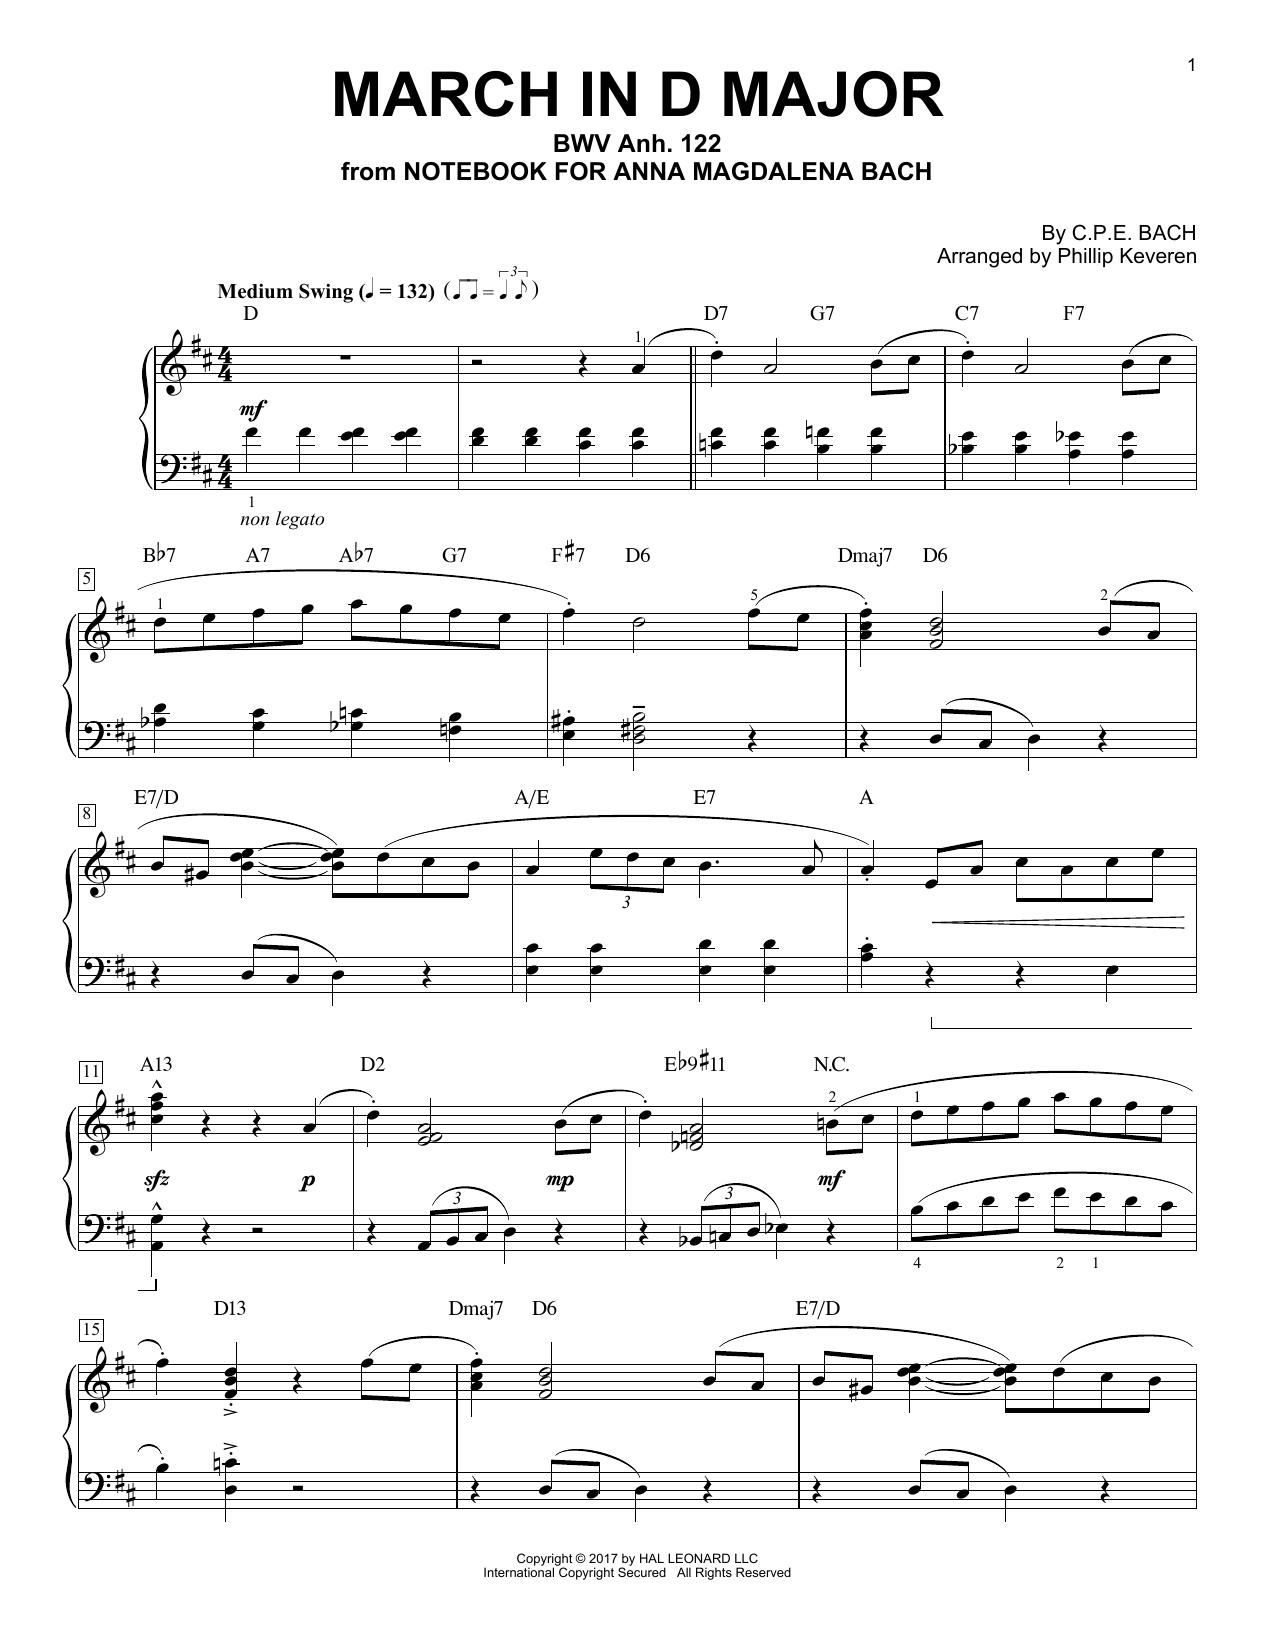 Johann Sebastian Bach March In D Major, BWV Anh. 122 [Jazz version] (arr. Phillip Keveren) sheet music notes and chords. Download Printable PDF.